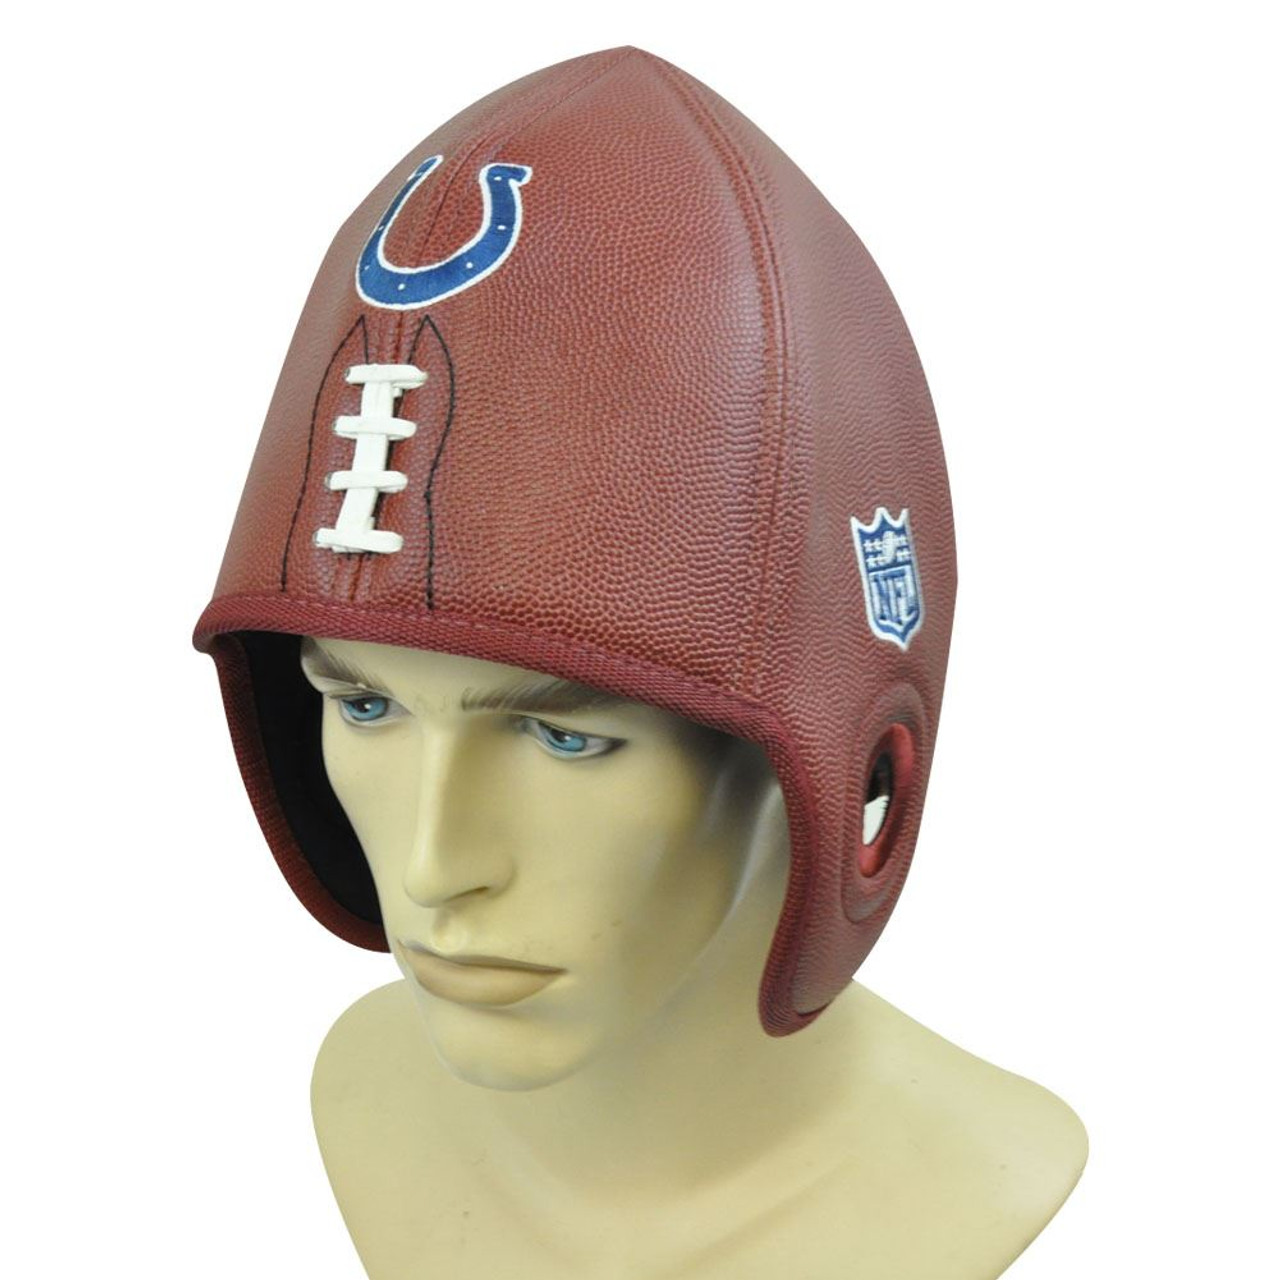 new arrivals 922b3 69a81 NFL Indianapolis Colts Reebok Faux Leather Football Shaped Helmet Head Hat  Cap